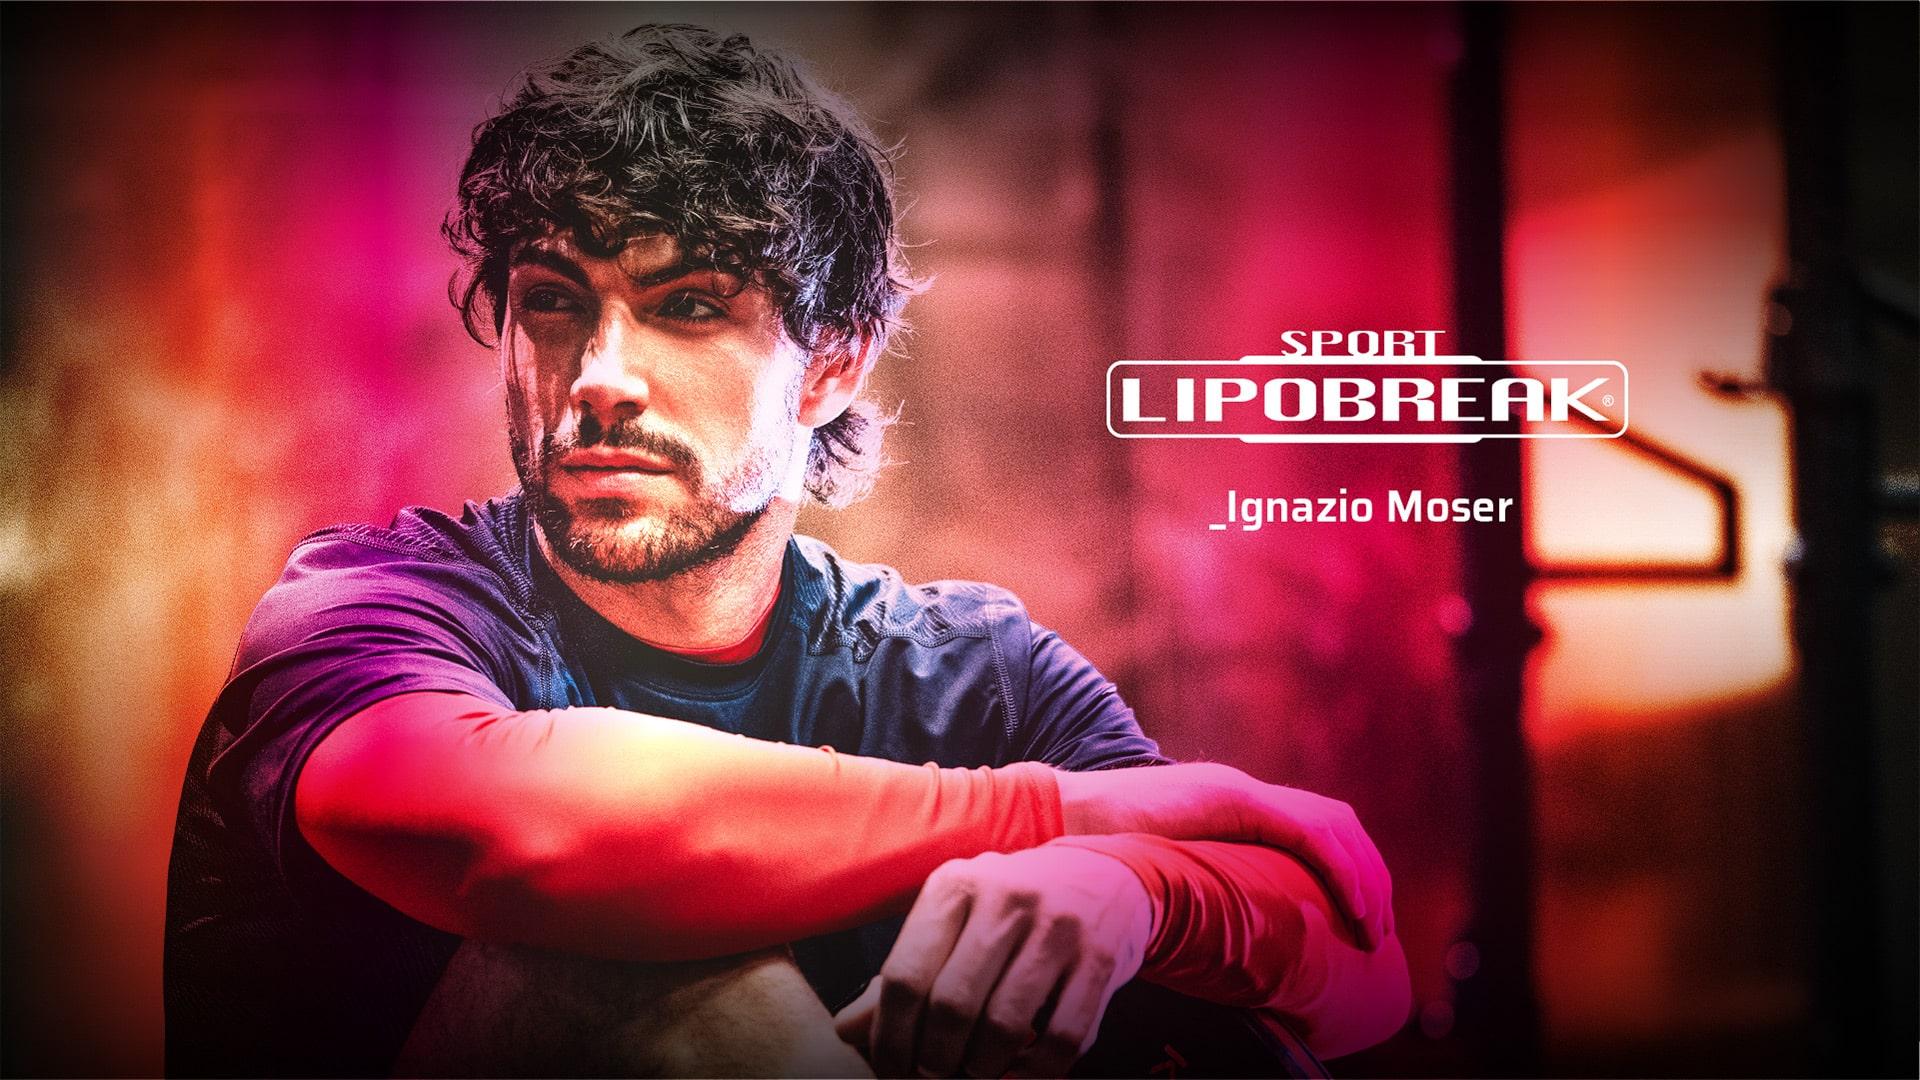 Ignazio Moser per Lipobreak